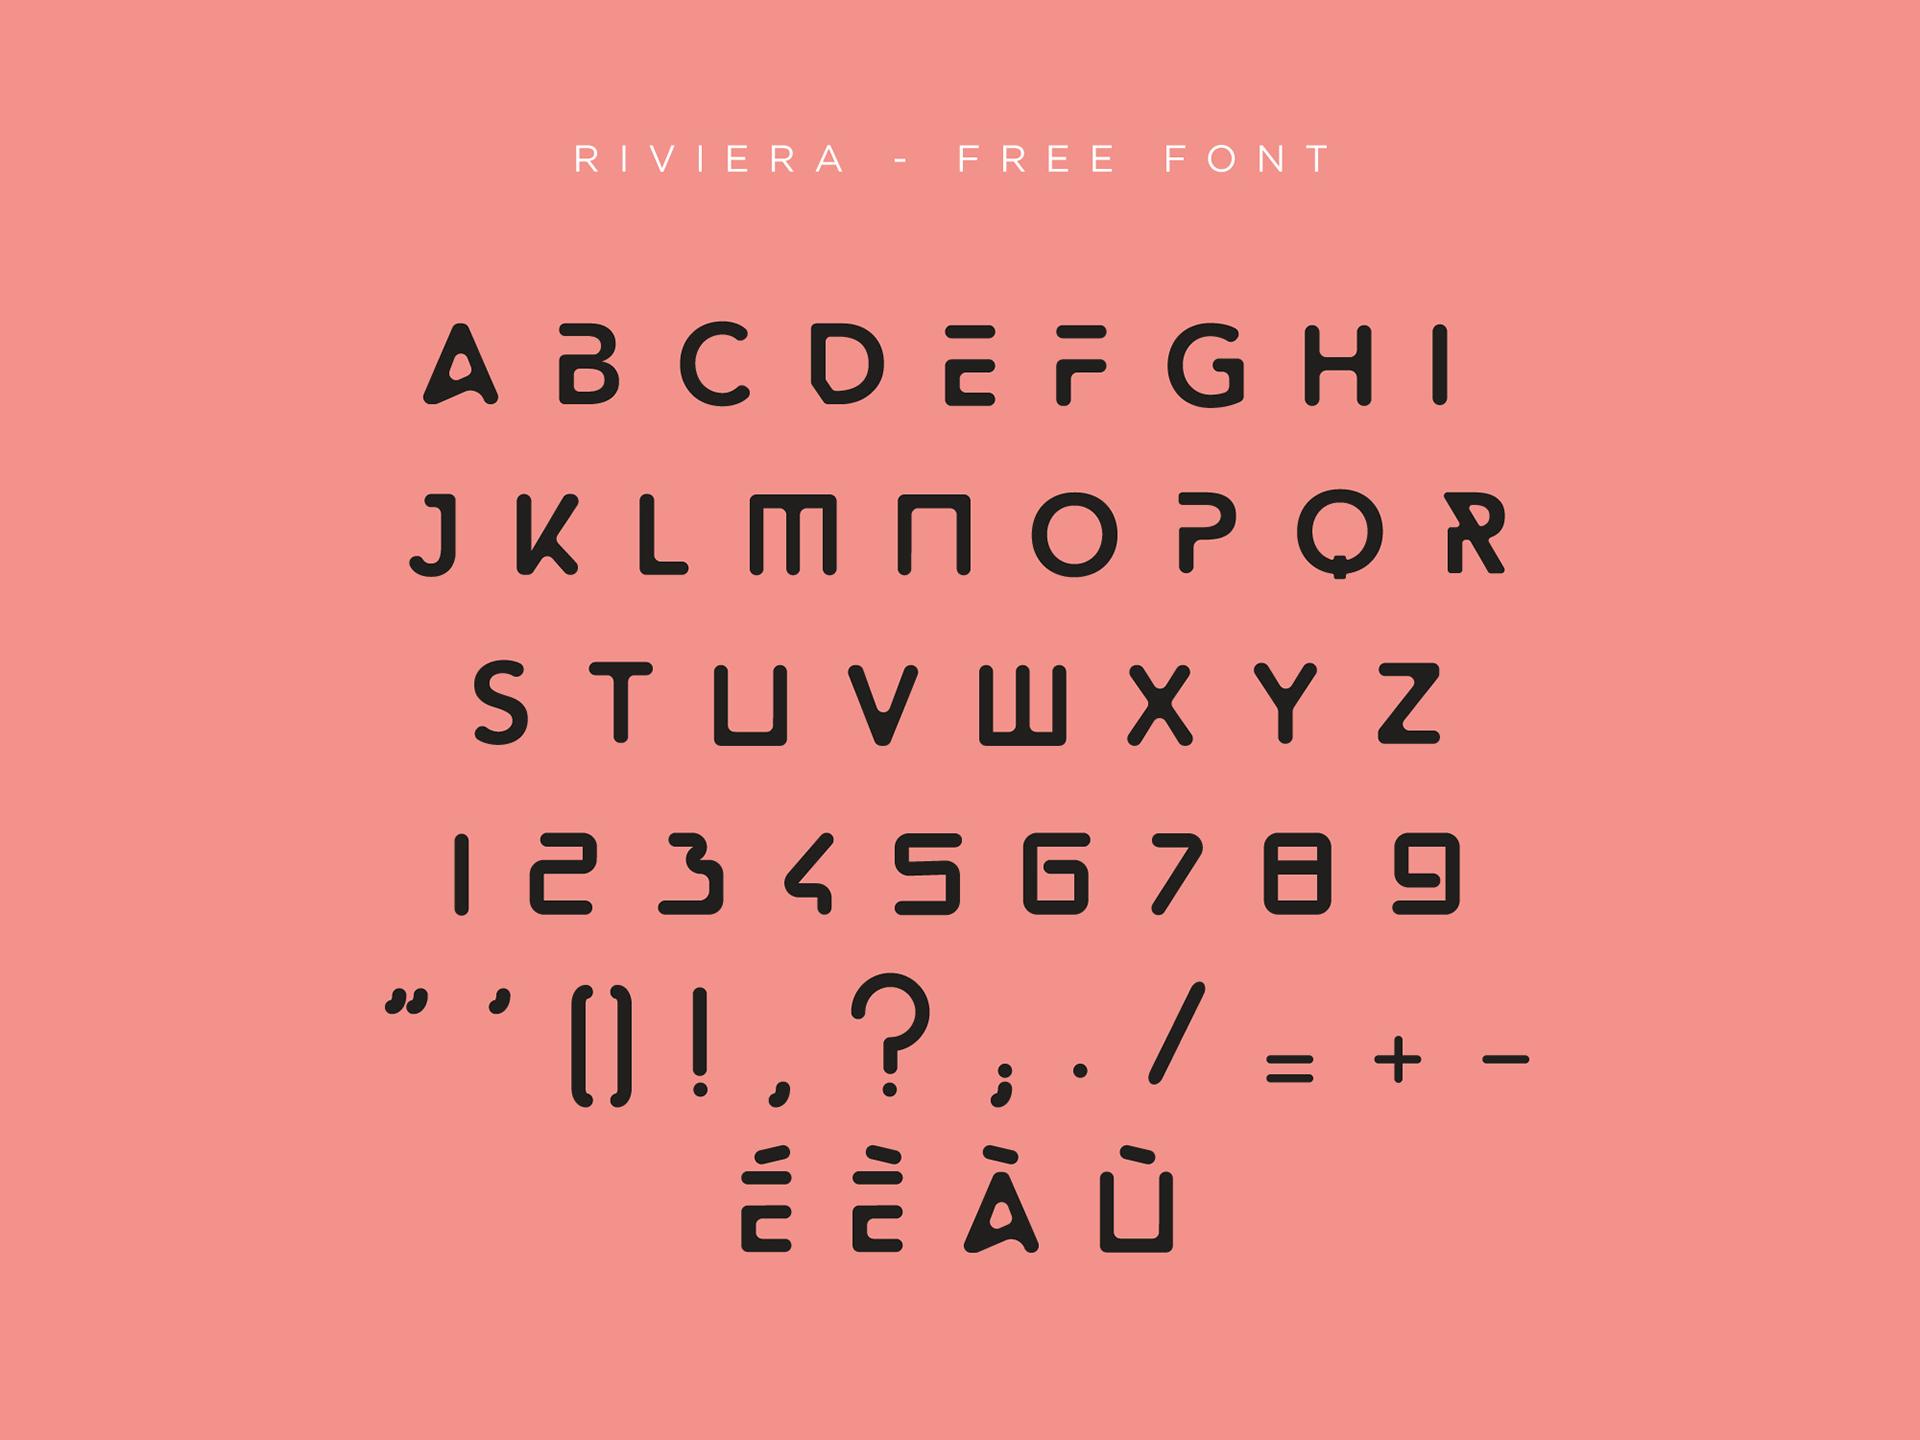 Riviera Free Font - decorative-display